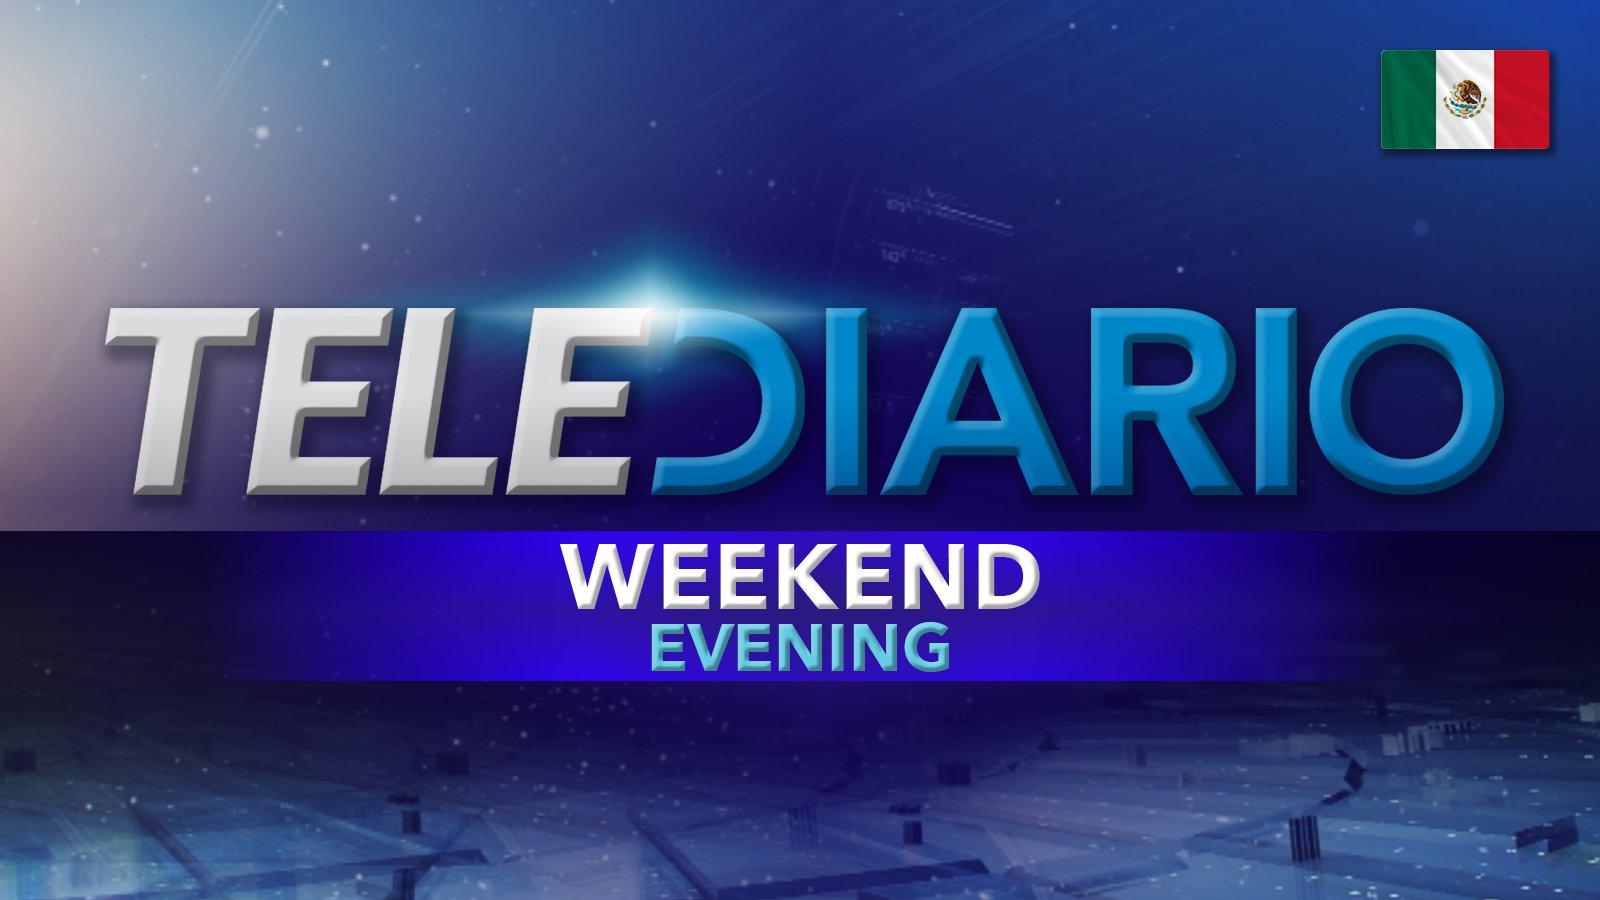 Weekend Evening Telediario poster